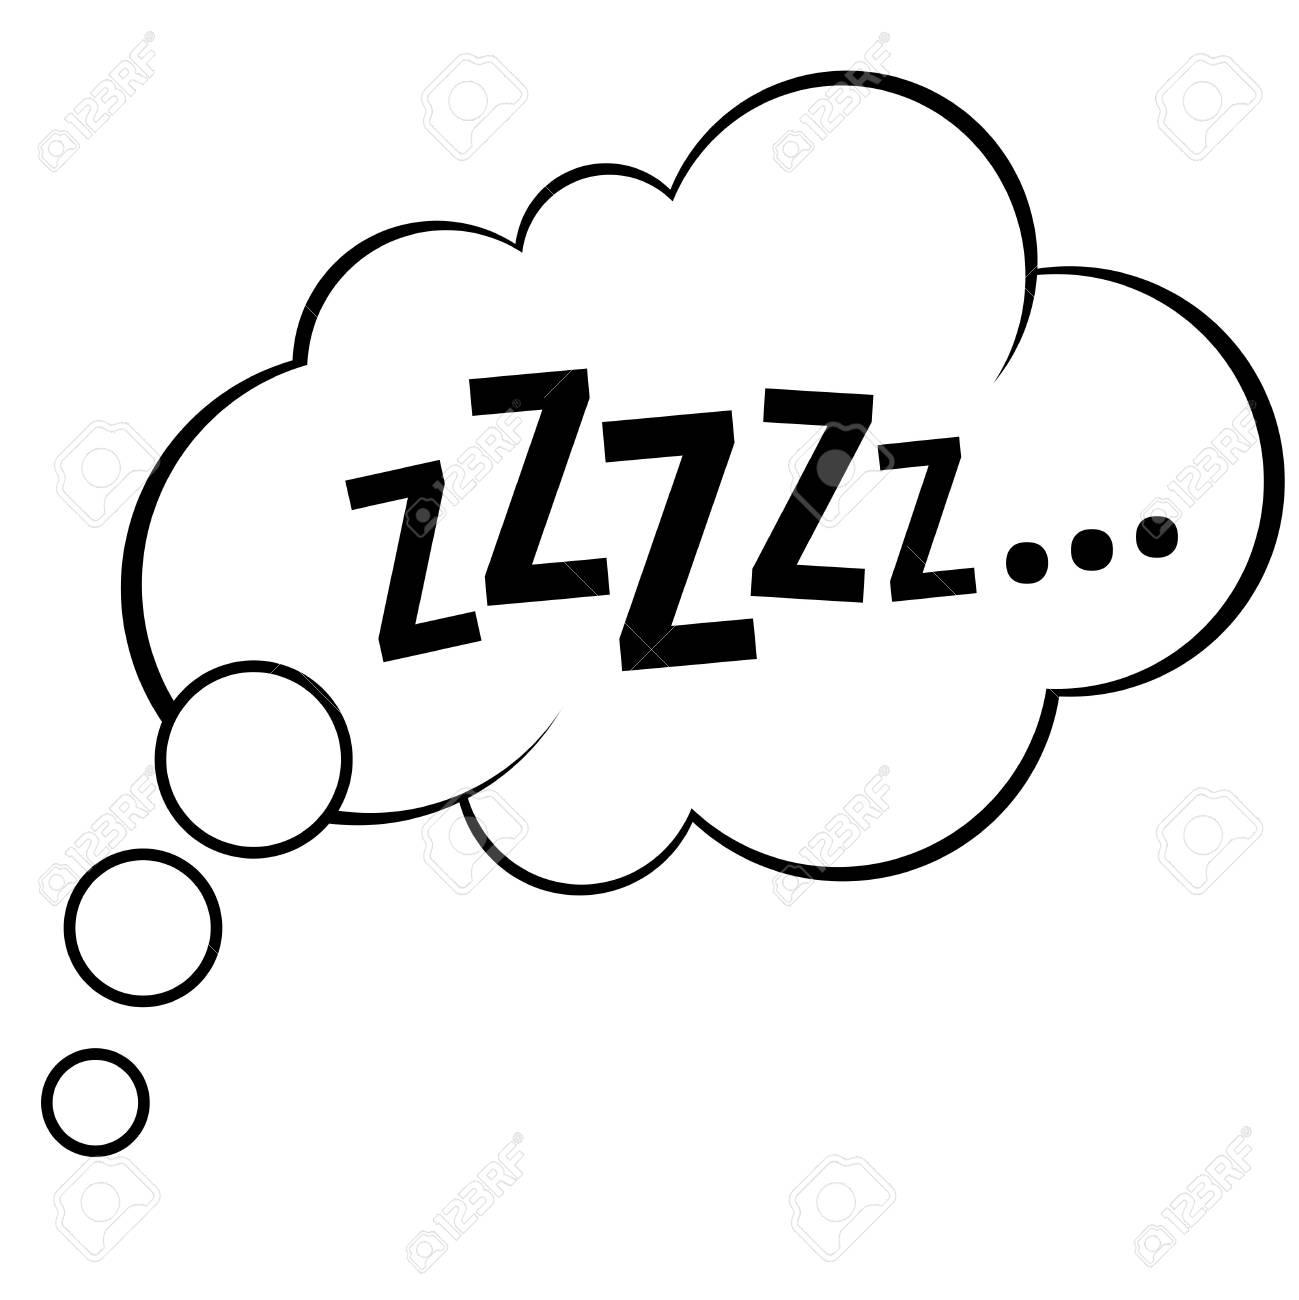 Sleep comic bubble zzzzz vector illustration - 97575232